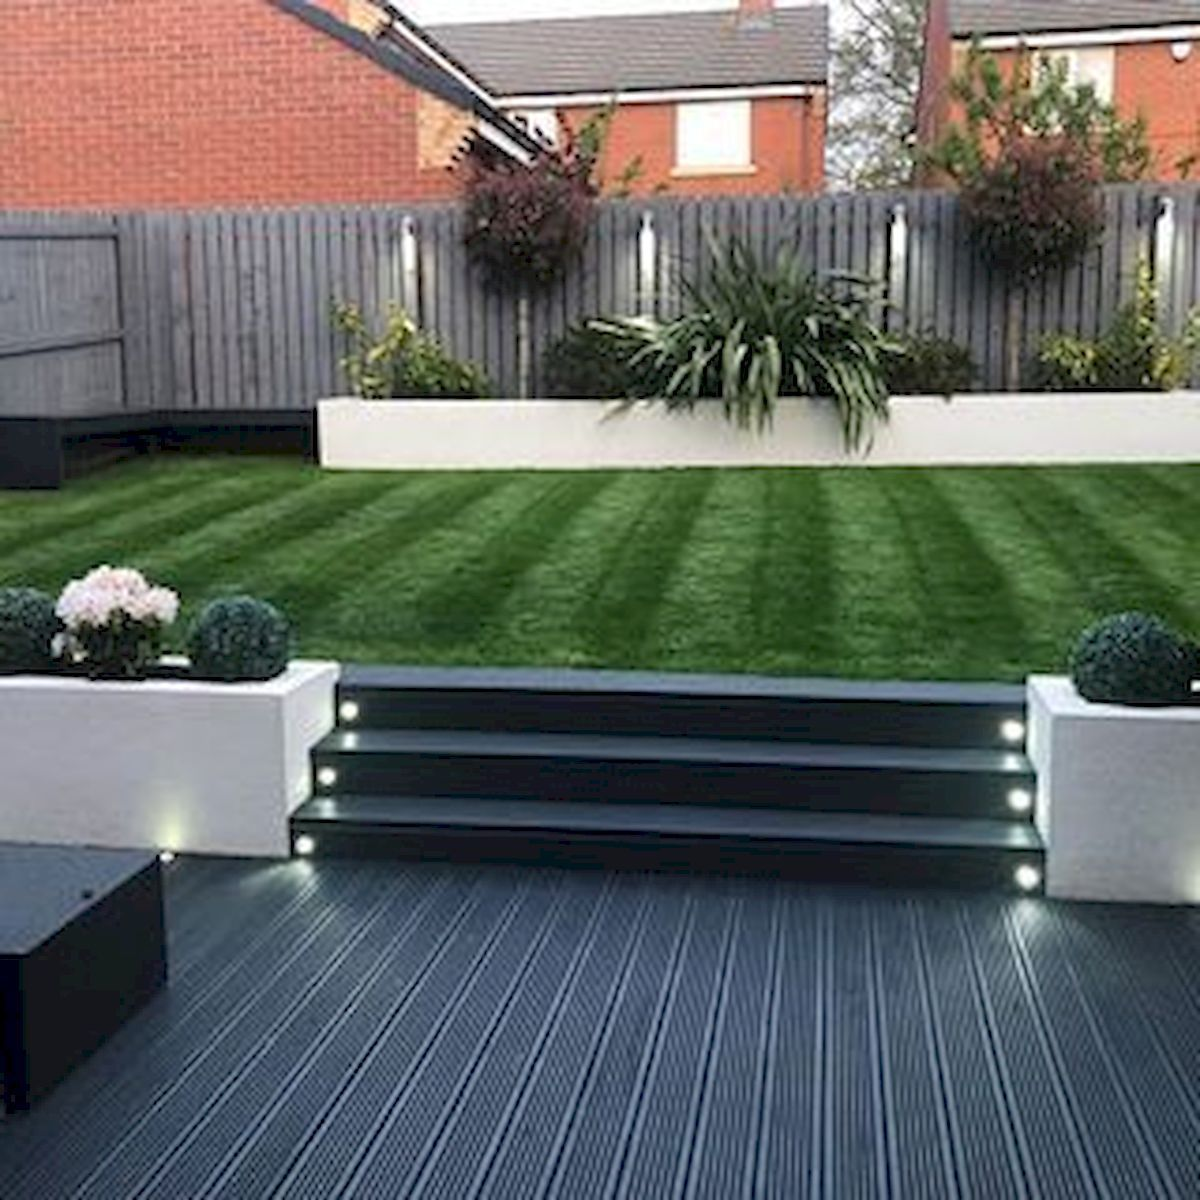 40 Fabulous Modern Garden Designs Ideas For Front Yard And Backyard 1 Modern Garden Design Backyard Garden Design Modern Garden Modern outdoor garden ideas